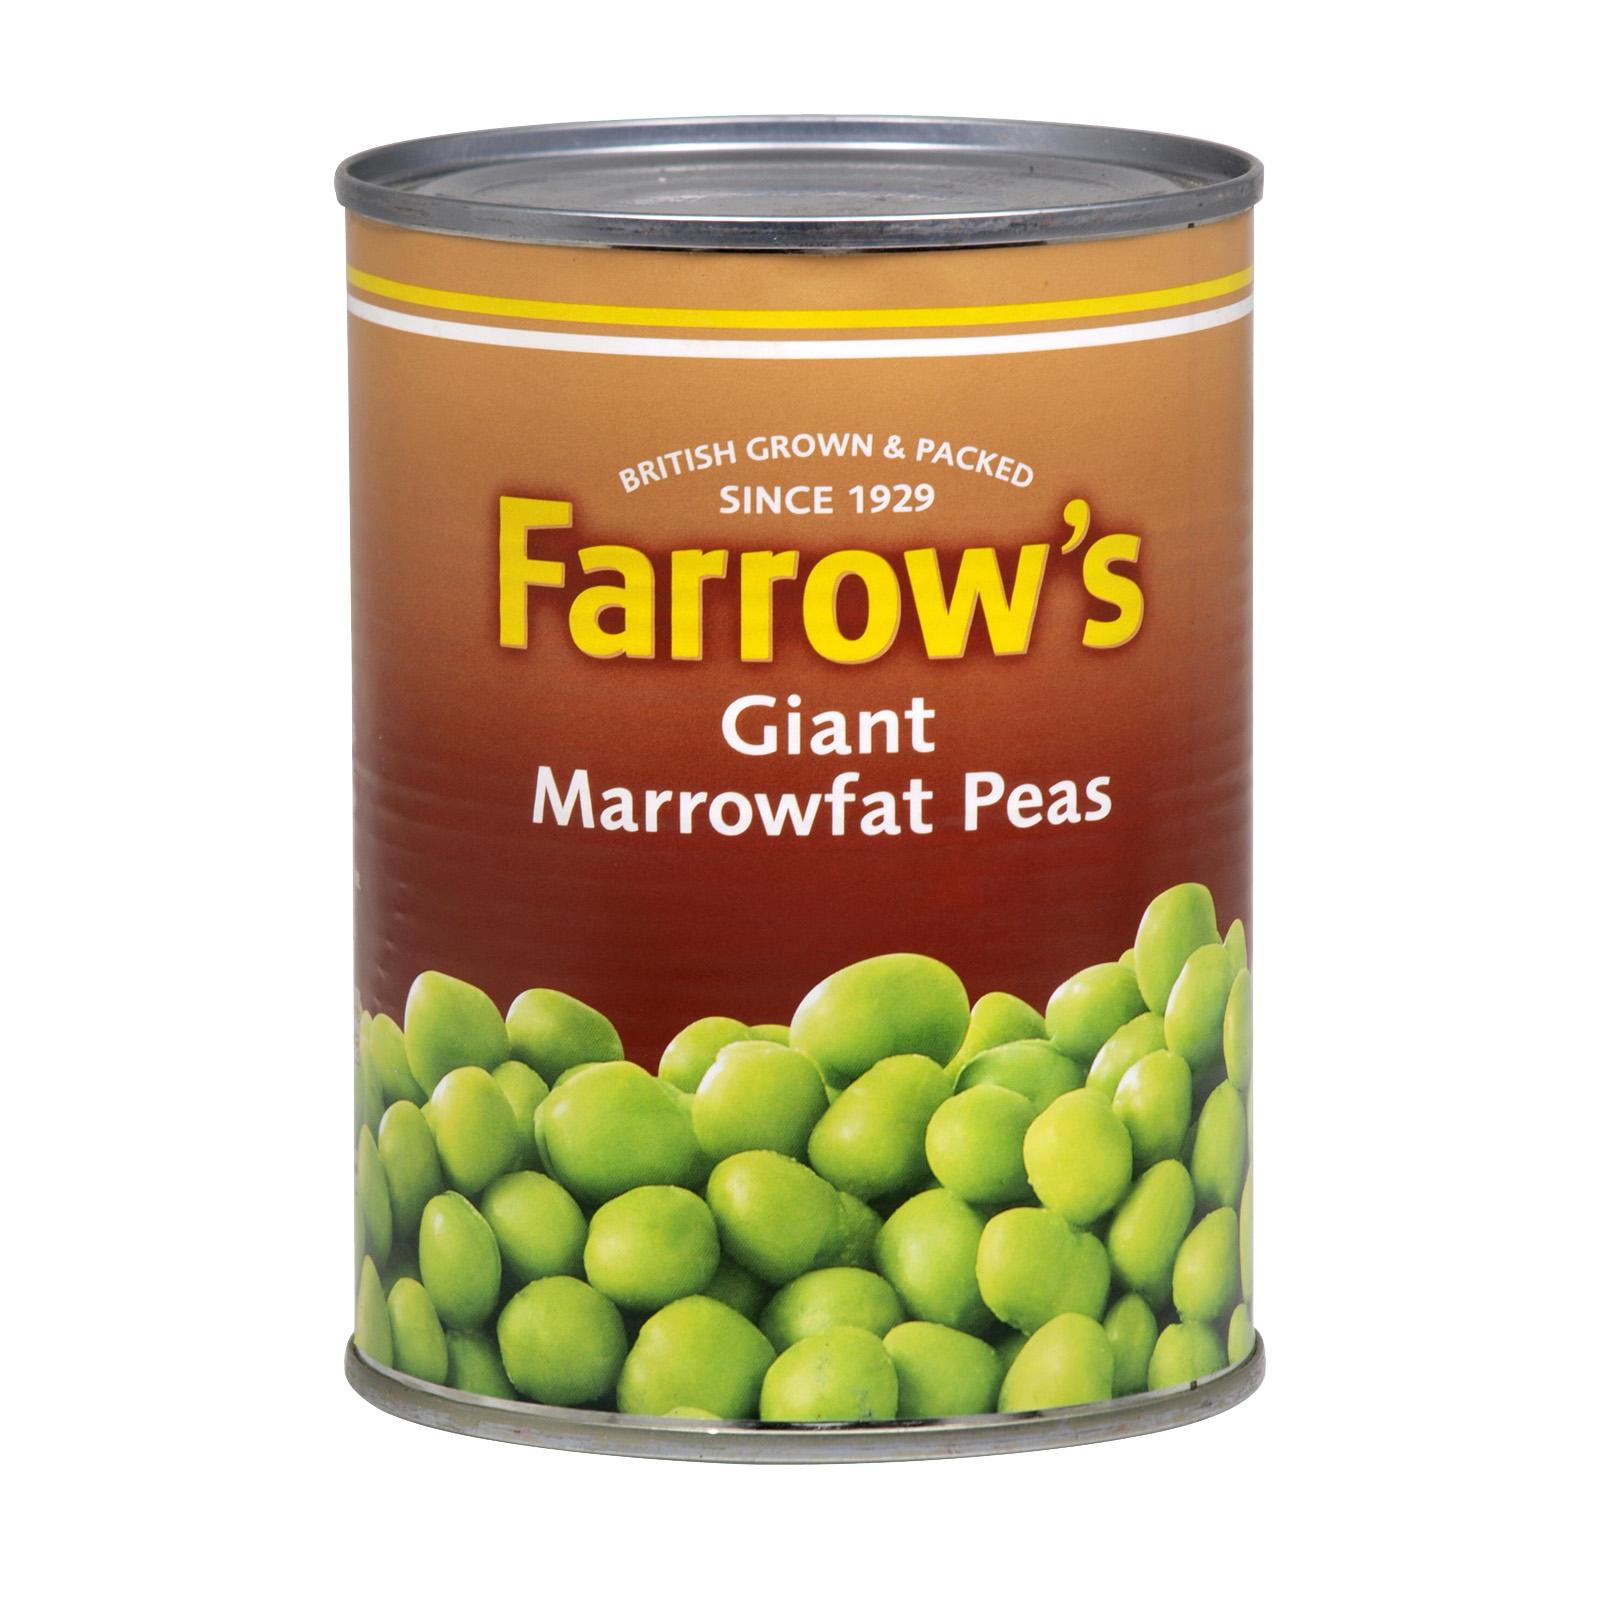 FARROWS GIANT MARROWFAT PEAS 538GM X24